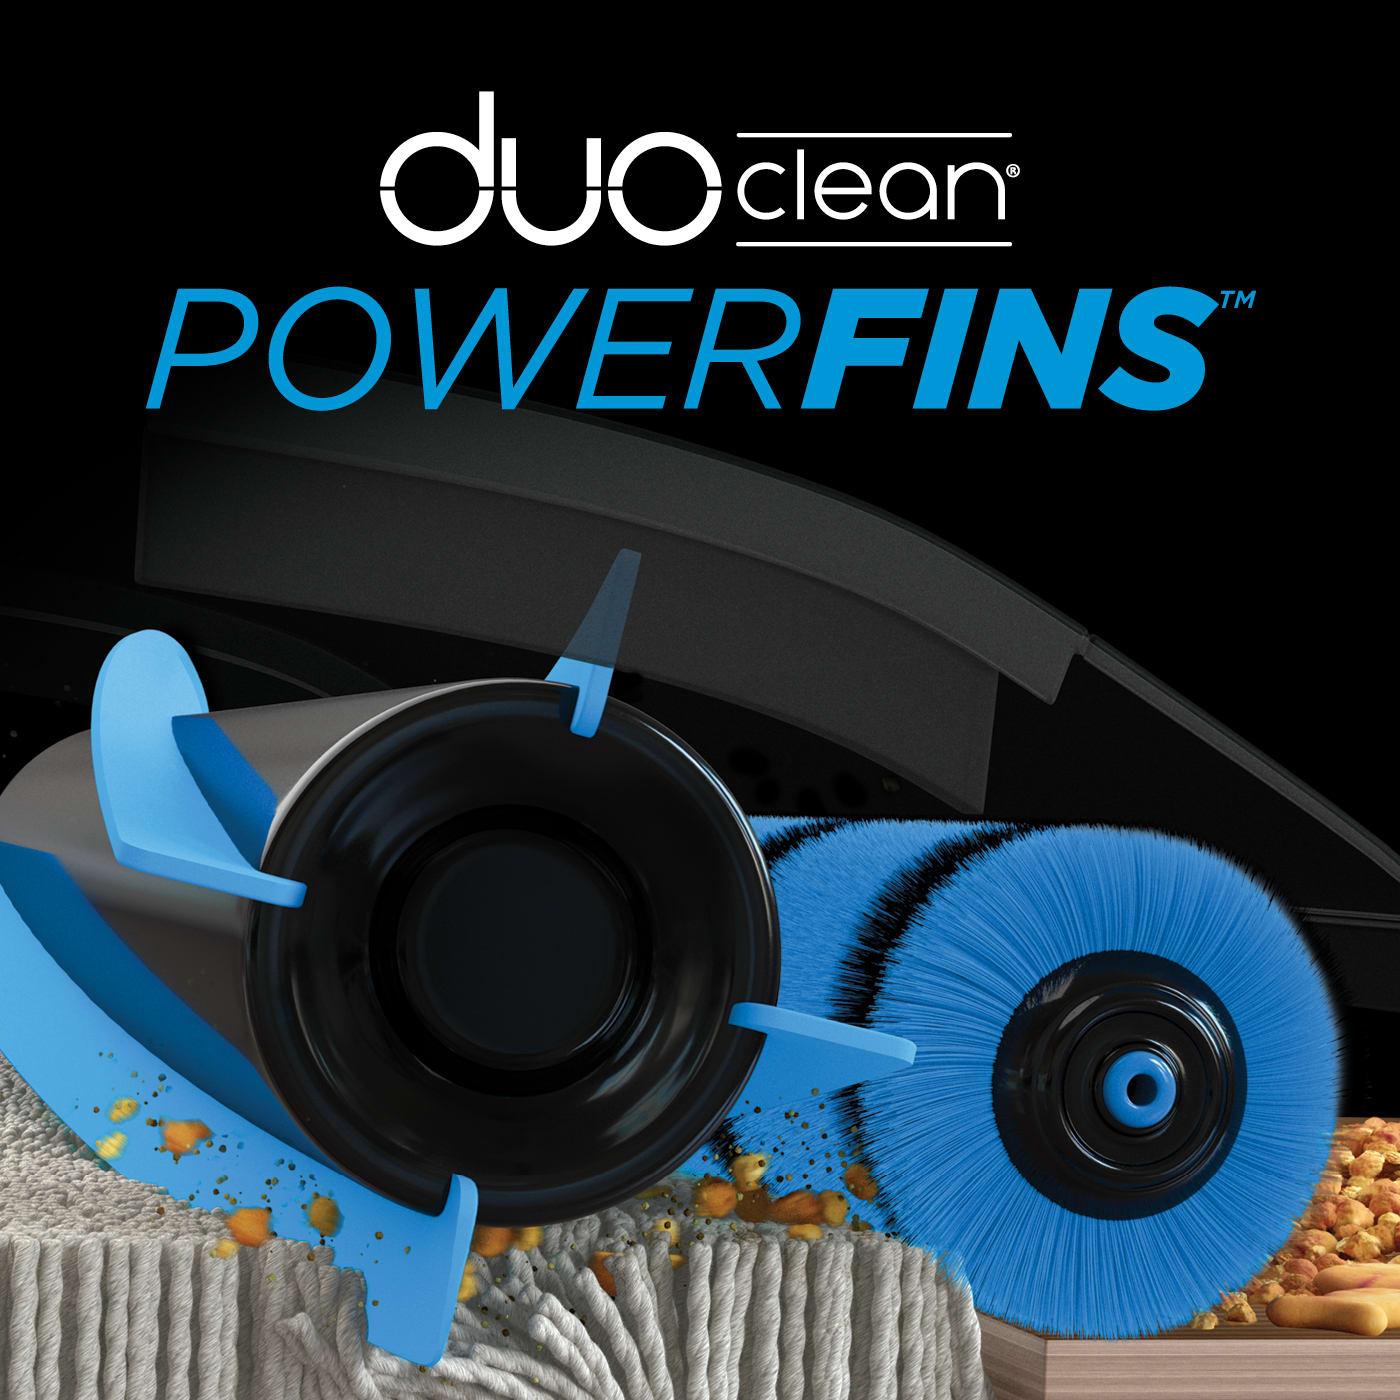 DuoClean® PowerFins